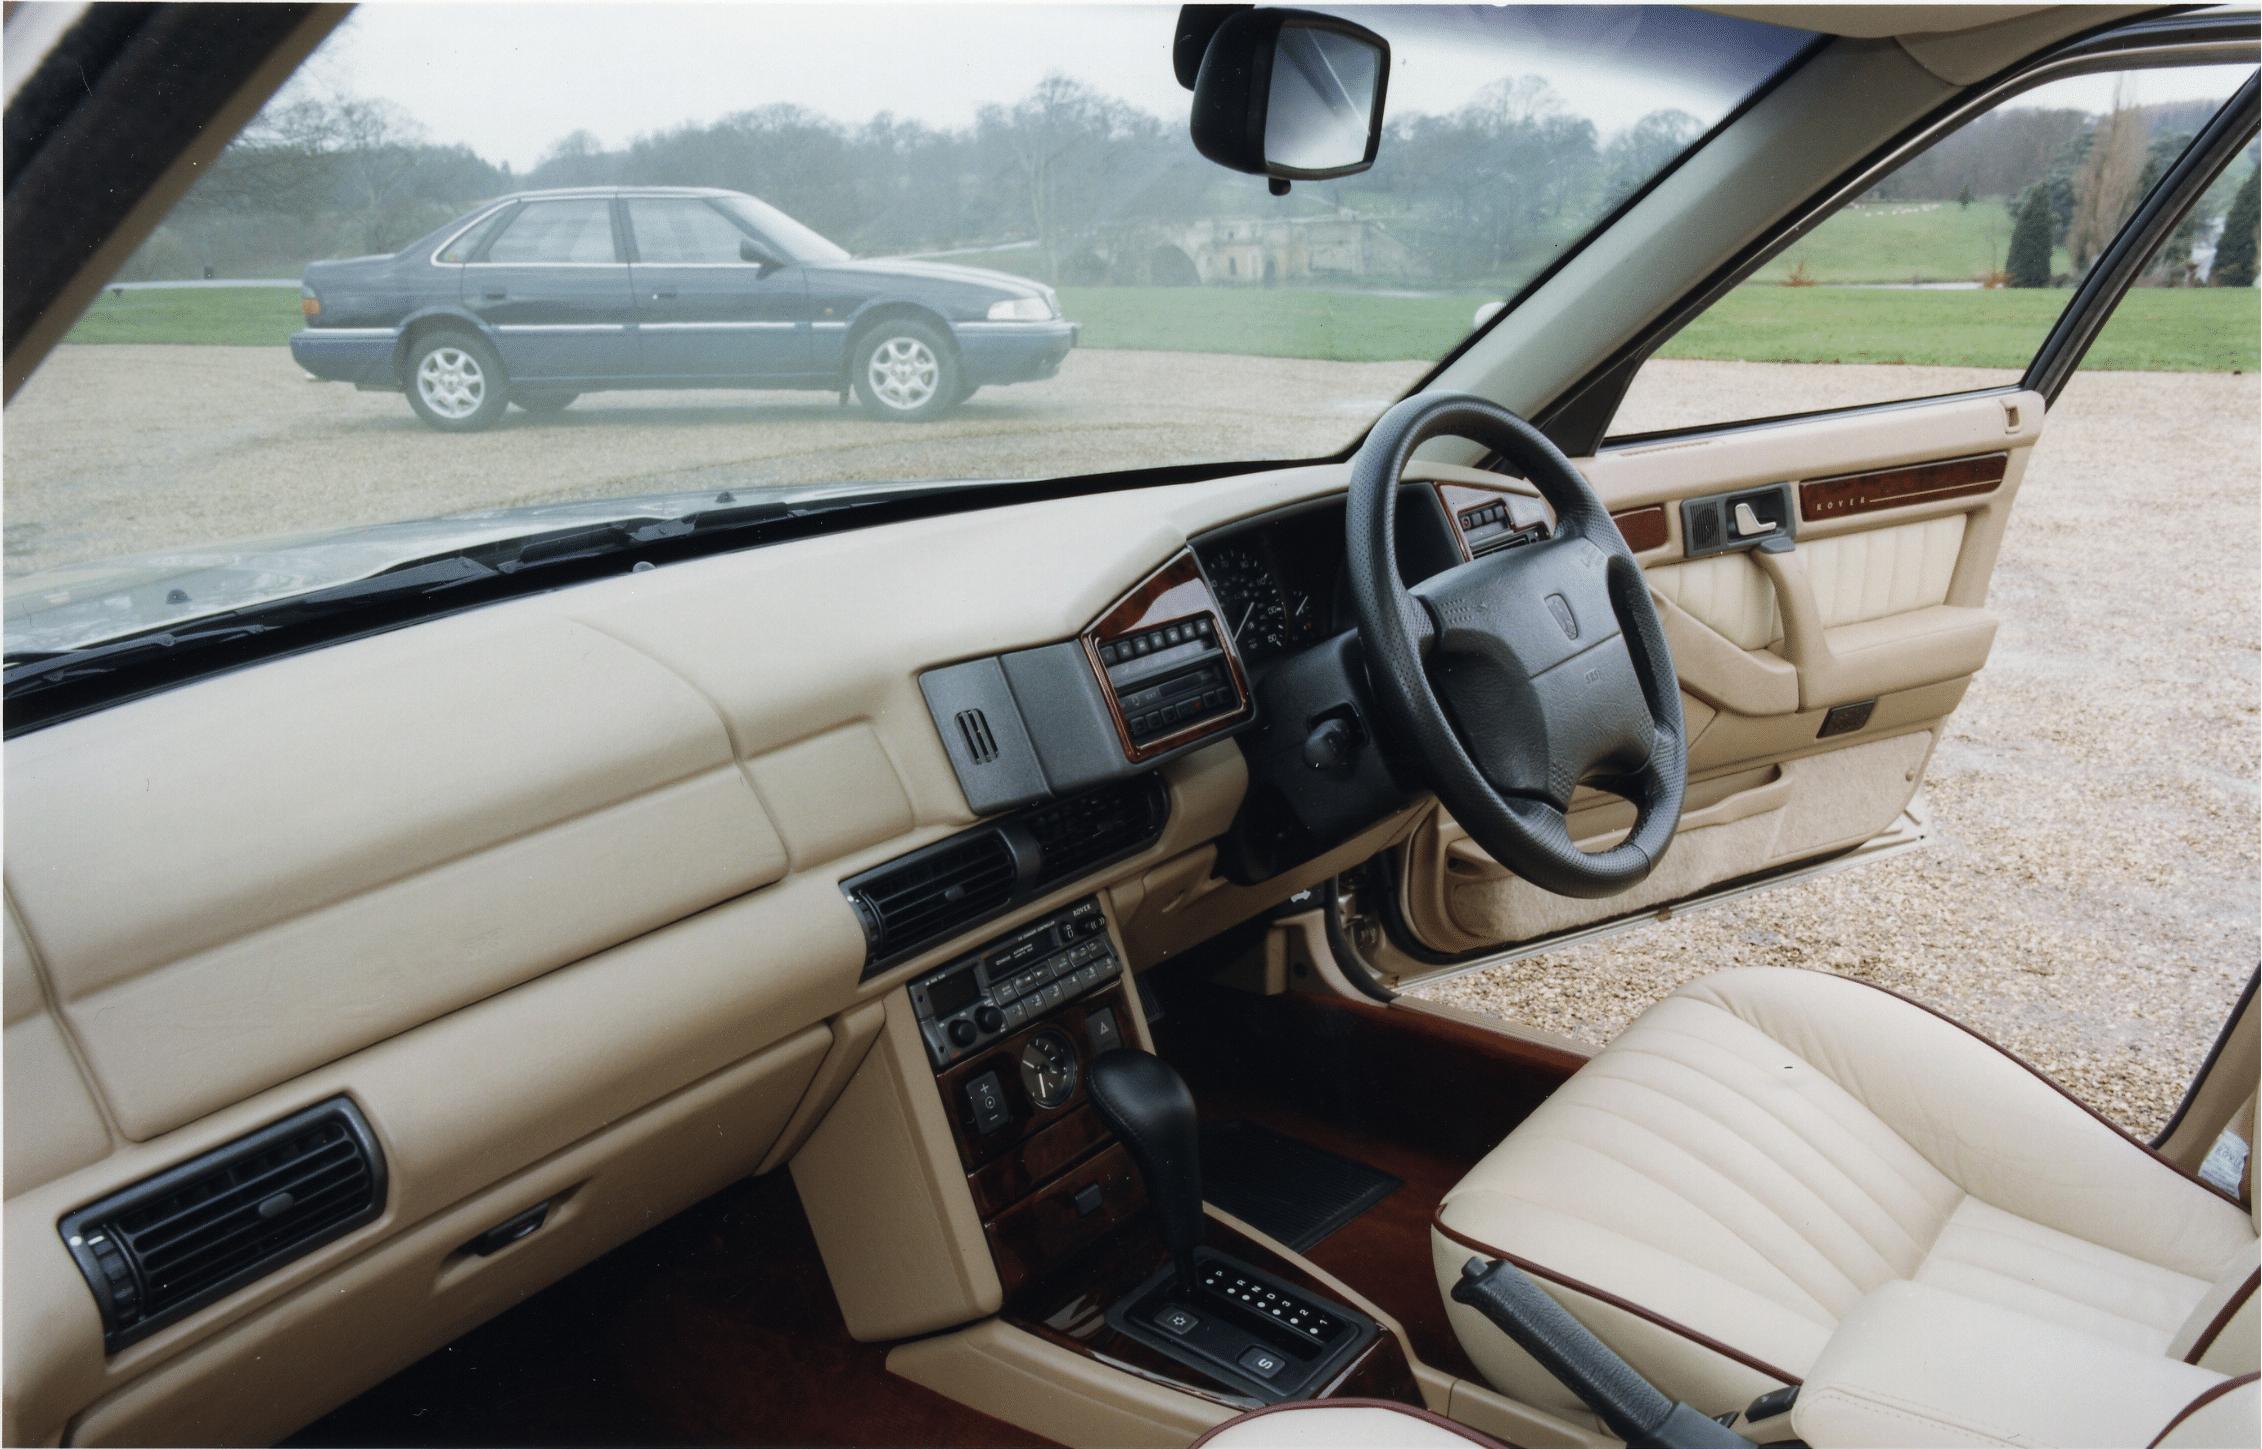 Rover 800, rover, 800, vitesse, stirling, rover vitesse, rover stirling, longbridge, british car, 820, 825, 827, coupe, saloon, turbo, classic car, retro car, motoring, automotive, motoring, car, cars